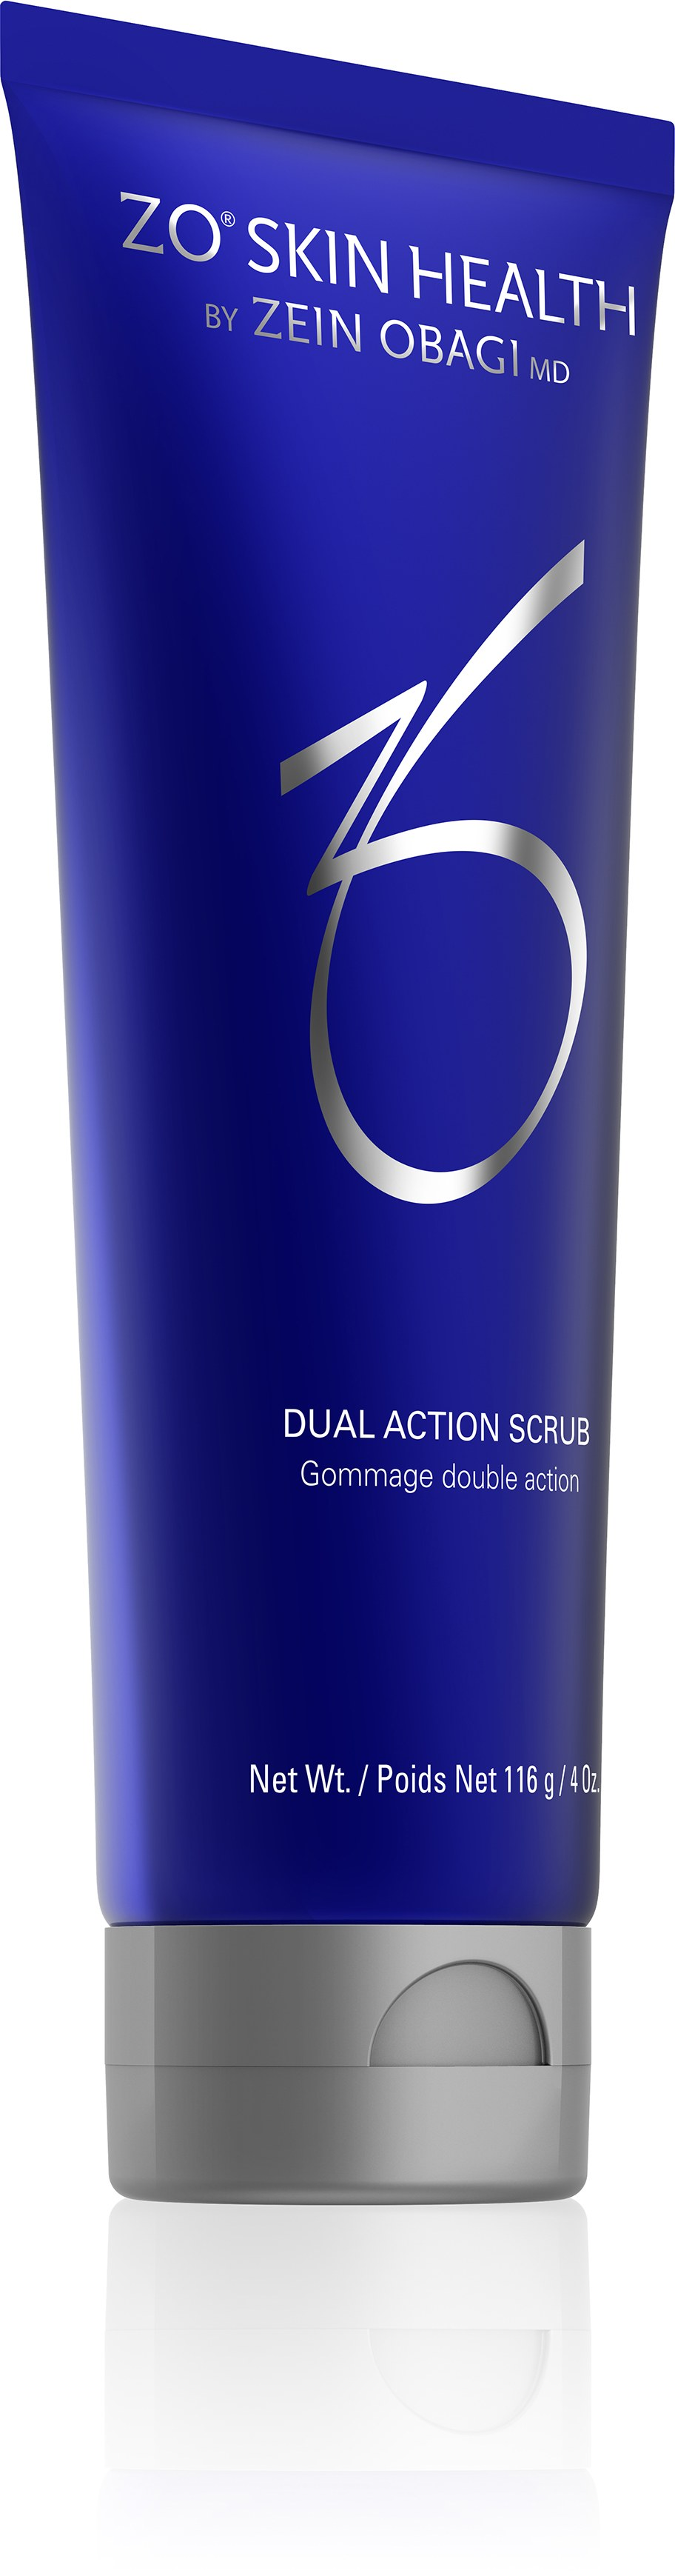 Dual action scrub